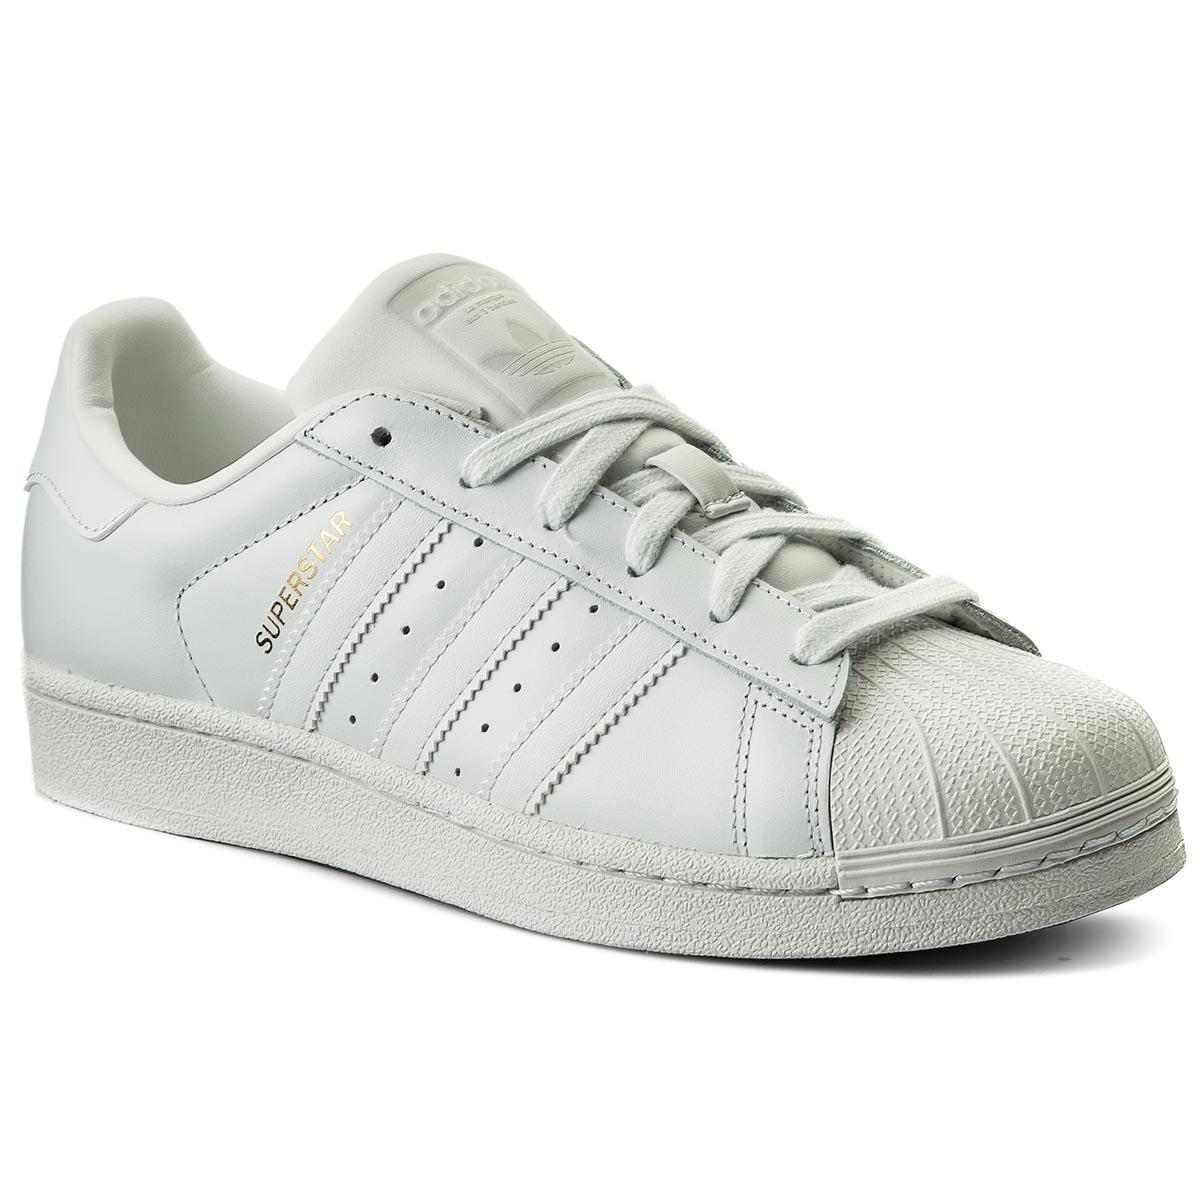 Cipő adidas - Superstar CM8073 Crywht Cgreen Cblack - Glami.hu c6172f7ba8